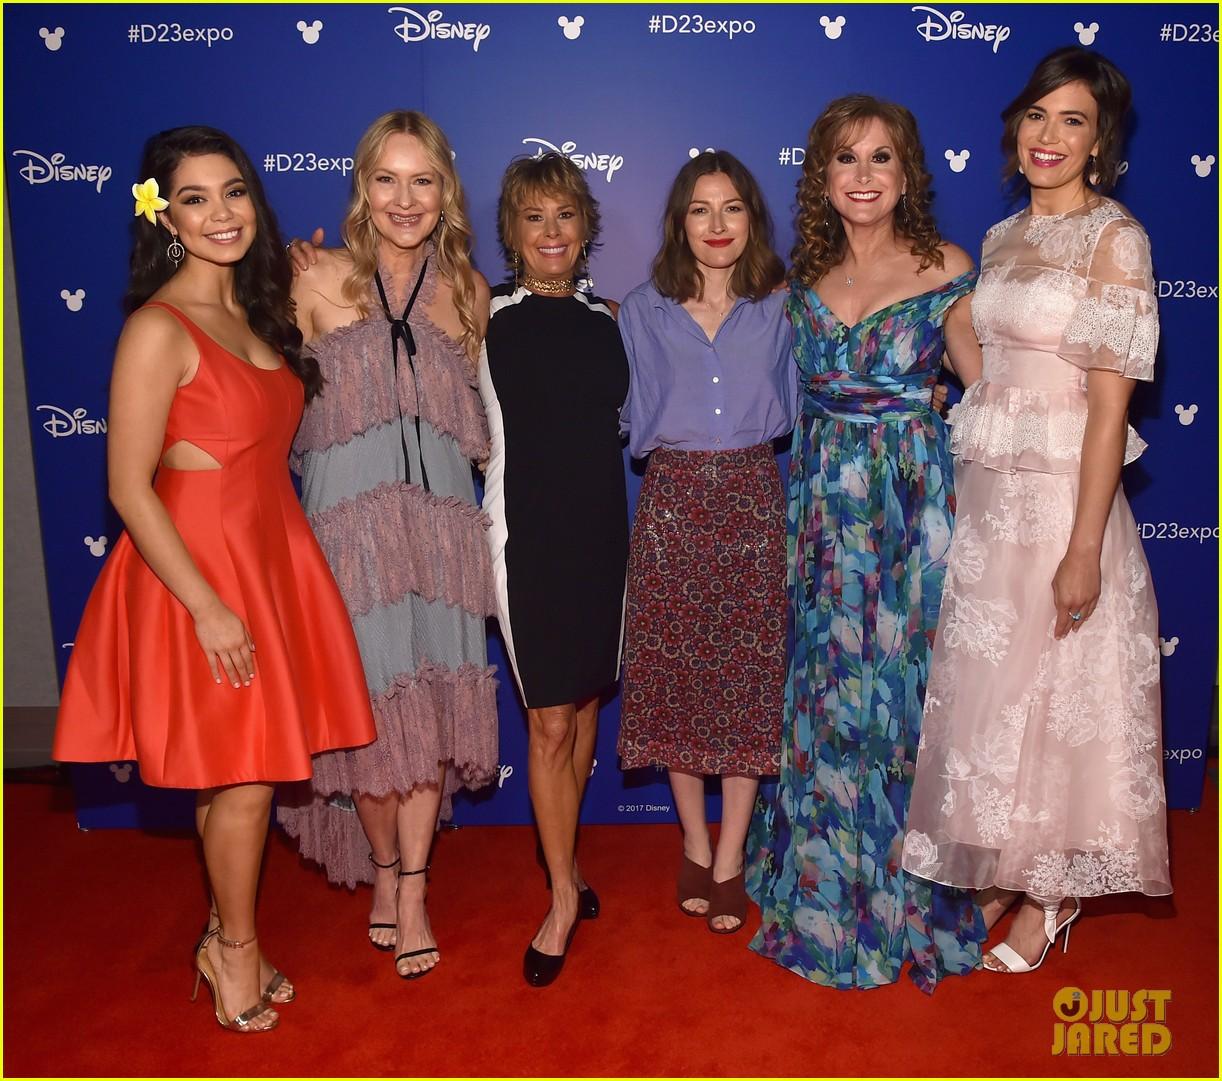 10 of disneys princess actresses met up for epic d23 photo 333928328